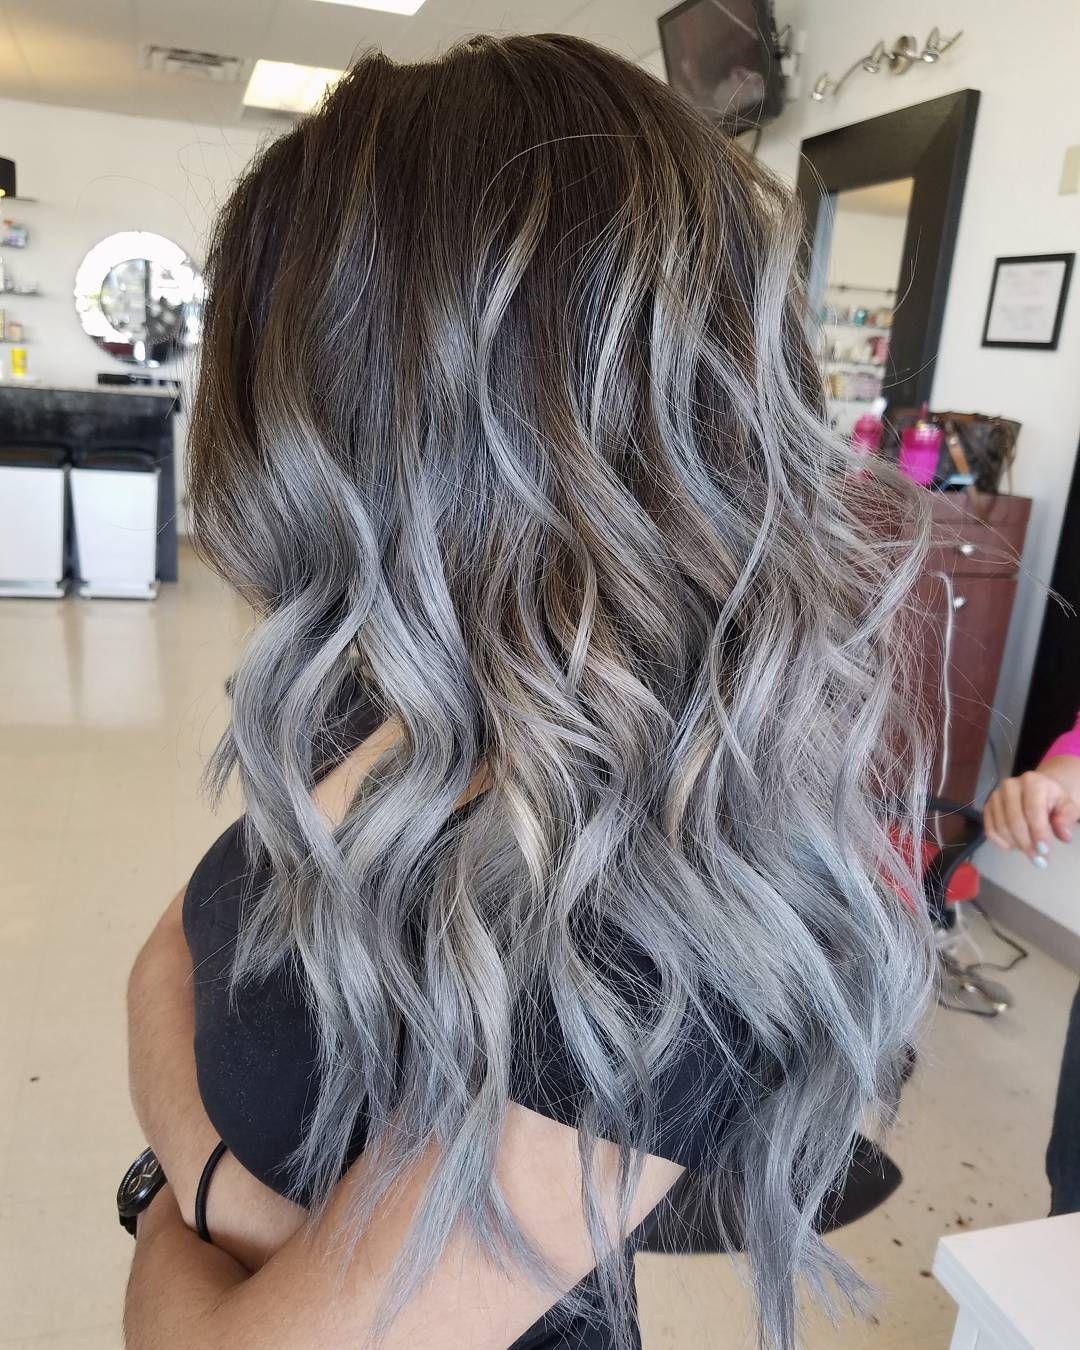 25 Amazing Ash Brown Hair Colors Your Subtle Beauty Silver Blonde Hair Ash Brown Hair Color Brown Ombre Hair